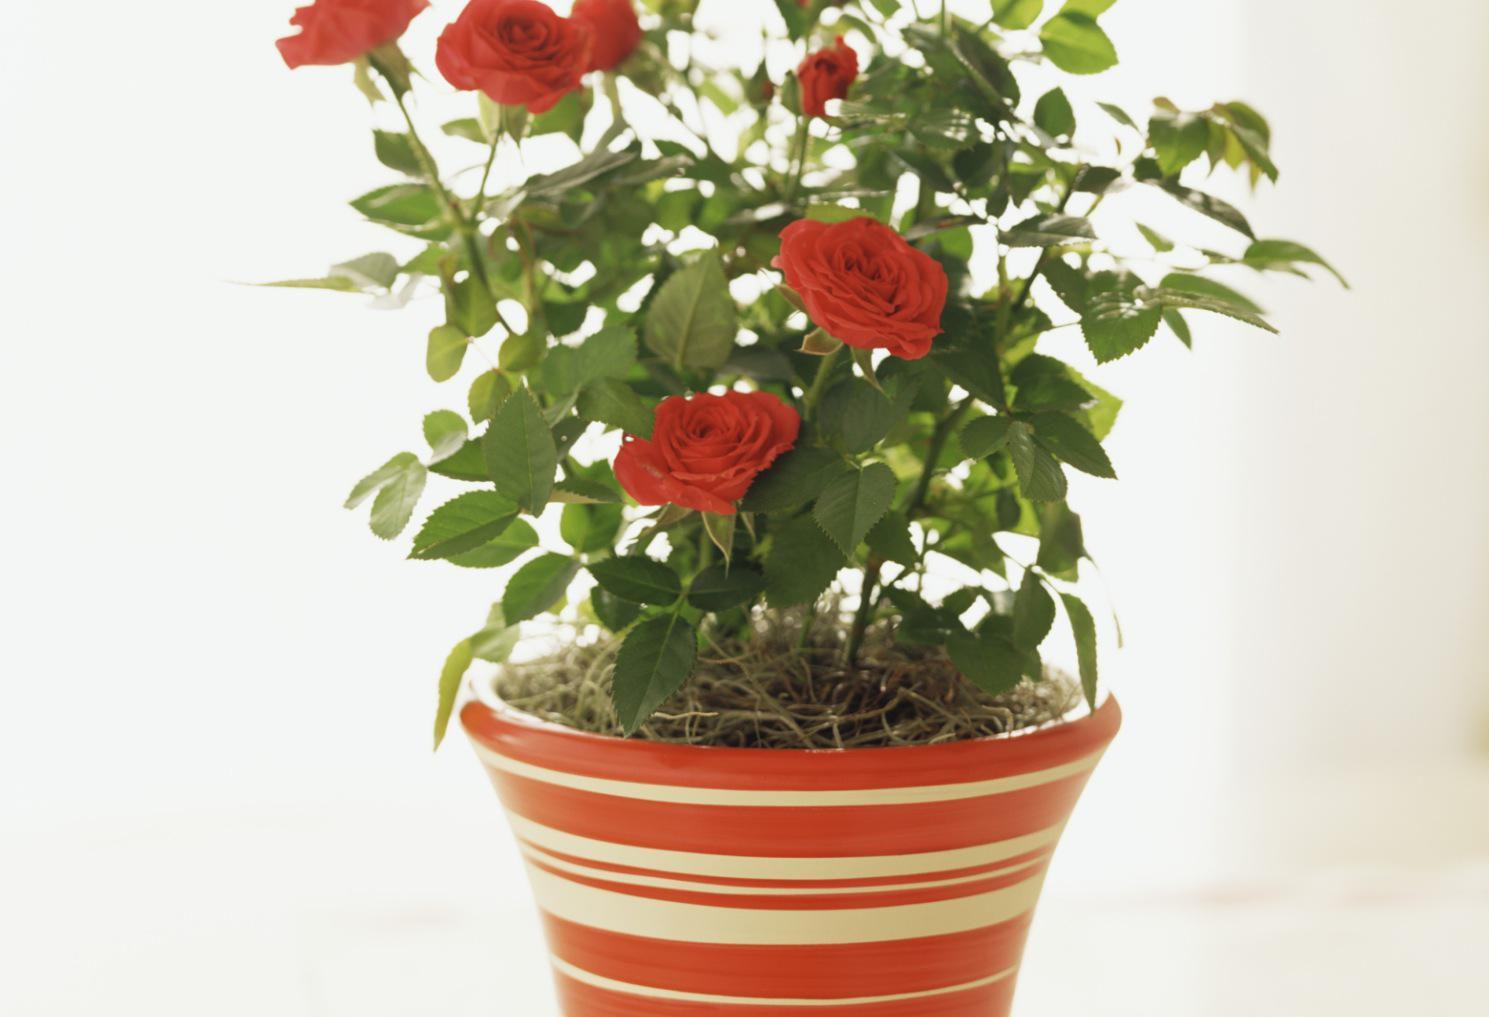 How To Grow Miniature Roses